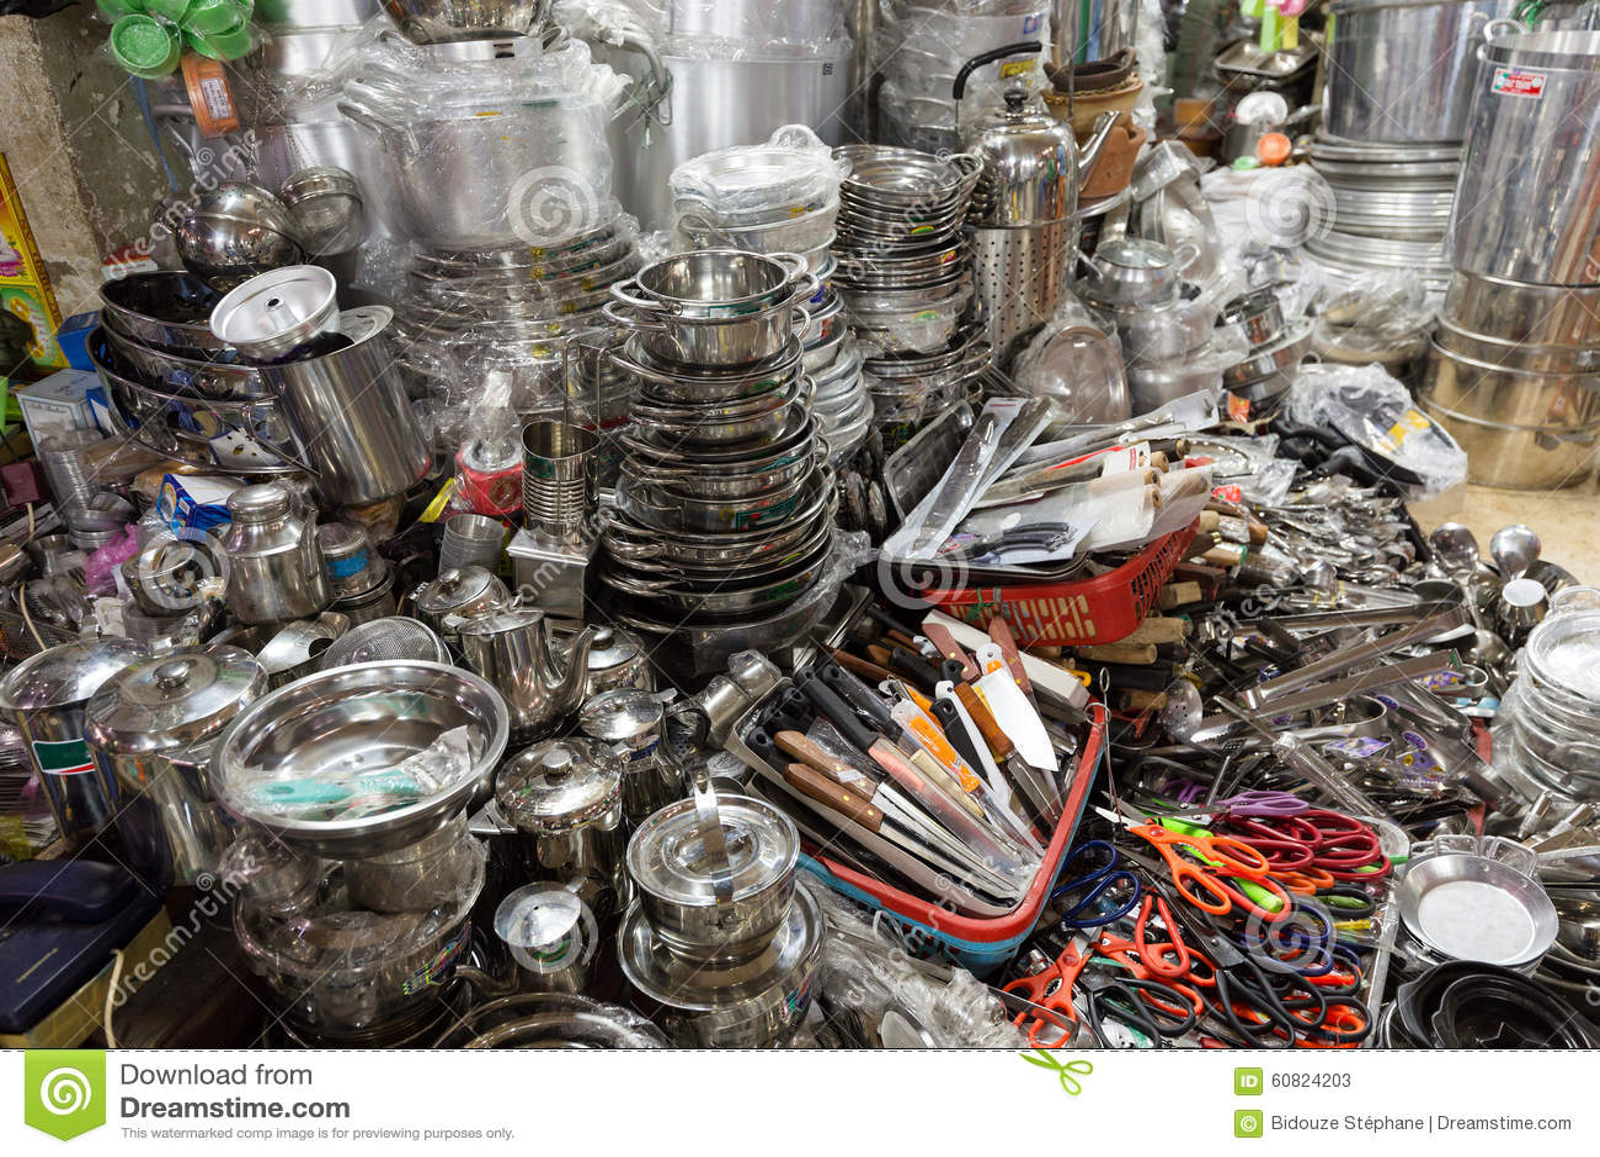 kitchen utensils store tool set asian shop stock image 60824203